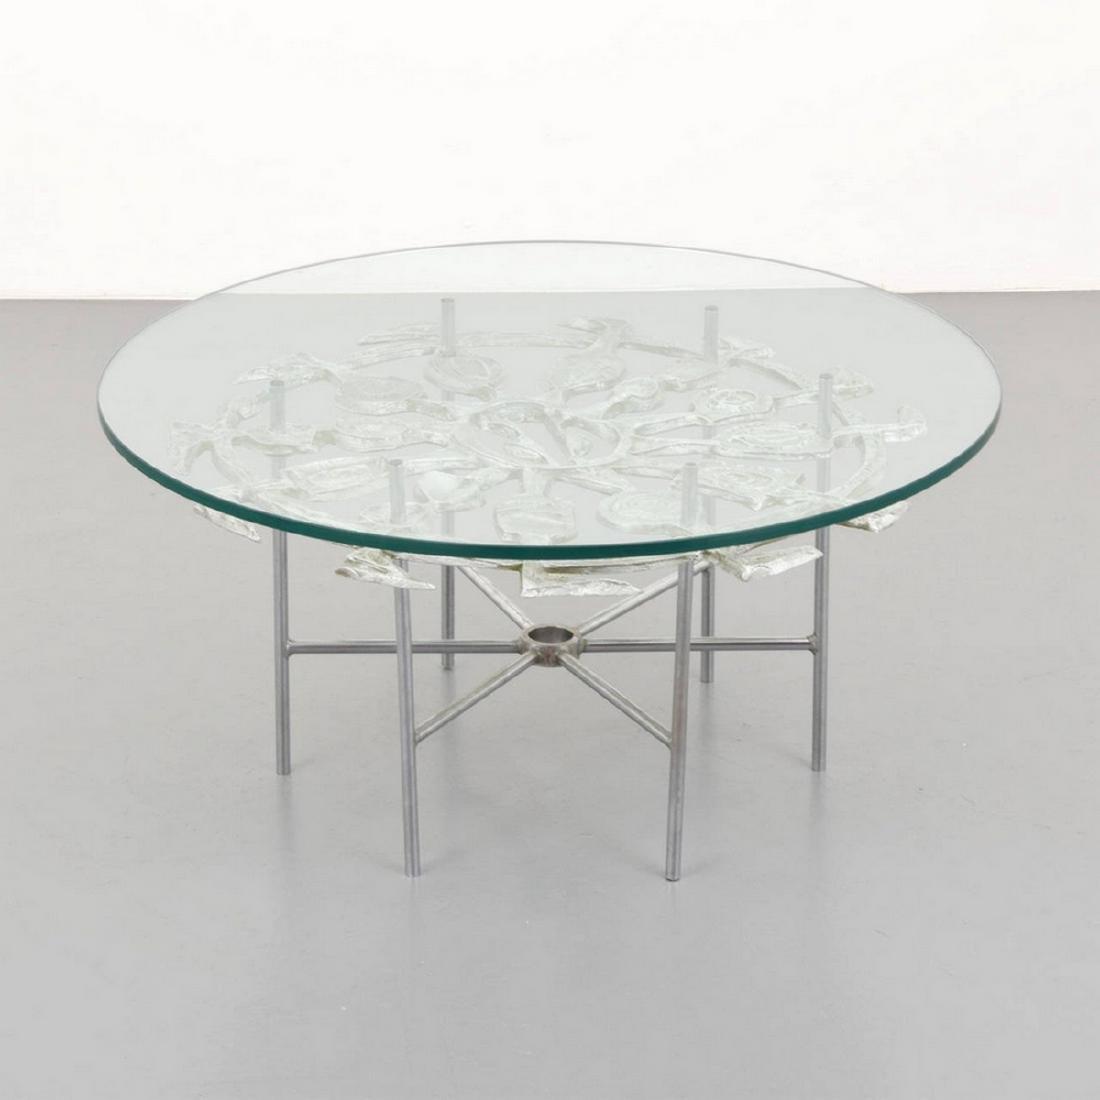 Donald Drumm Coffee Table - 4